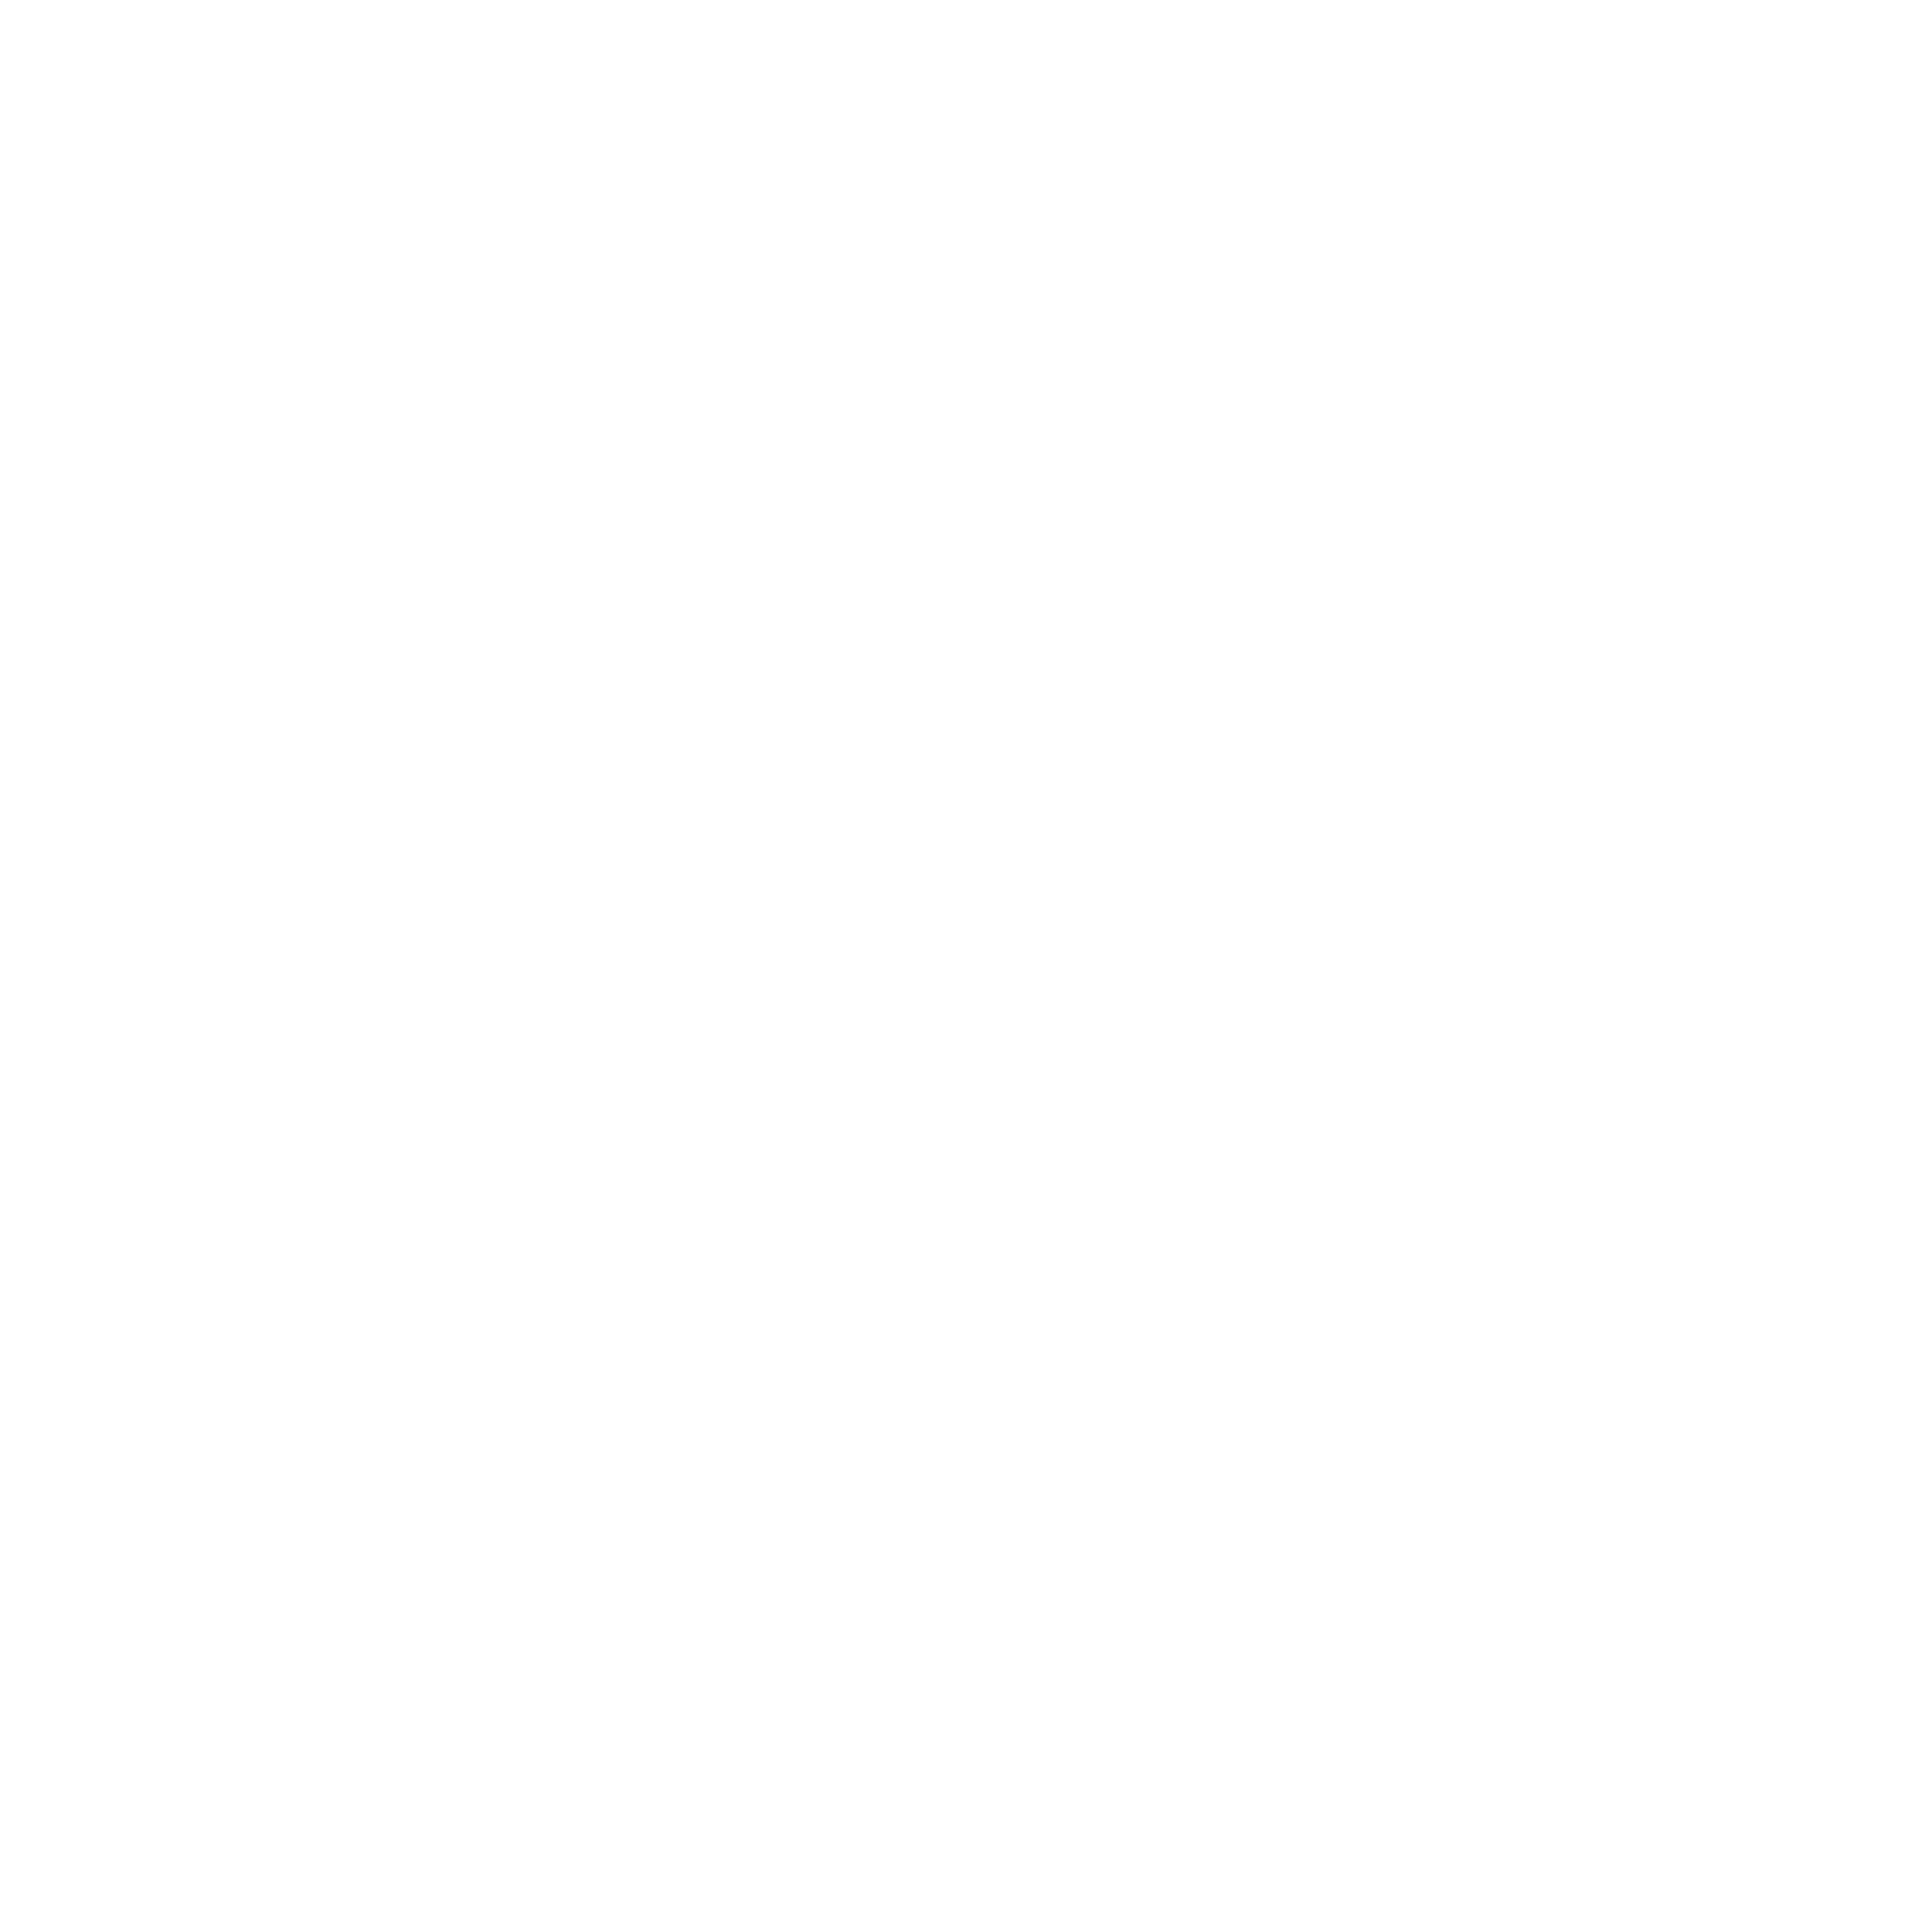 Fluidly Integrity Partnership Digital Partner